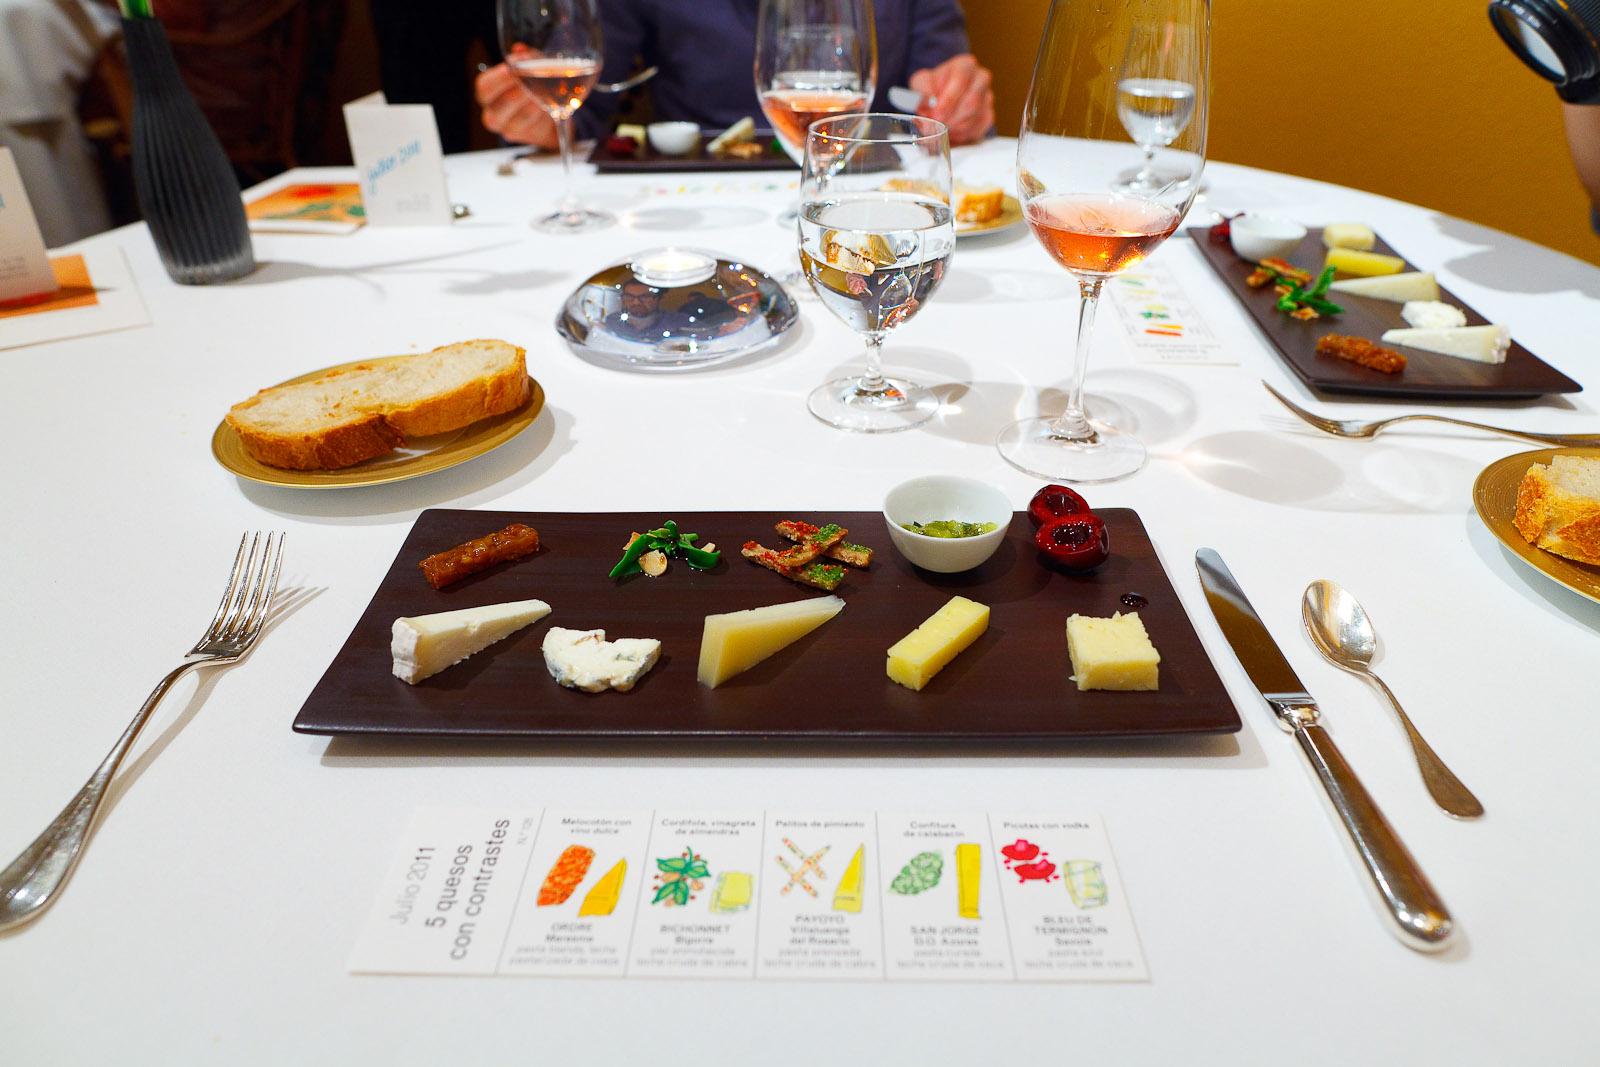 Cheese course: Ordre, peach with sweet wine - Bichonnet, cordifole, almonds, vinaigrette - Payoyo, pepper bread sticks - San Jorge, courgette preserve - bleu de termignon, bigarreau cherries with vodka